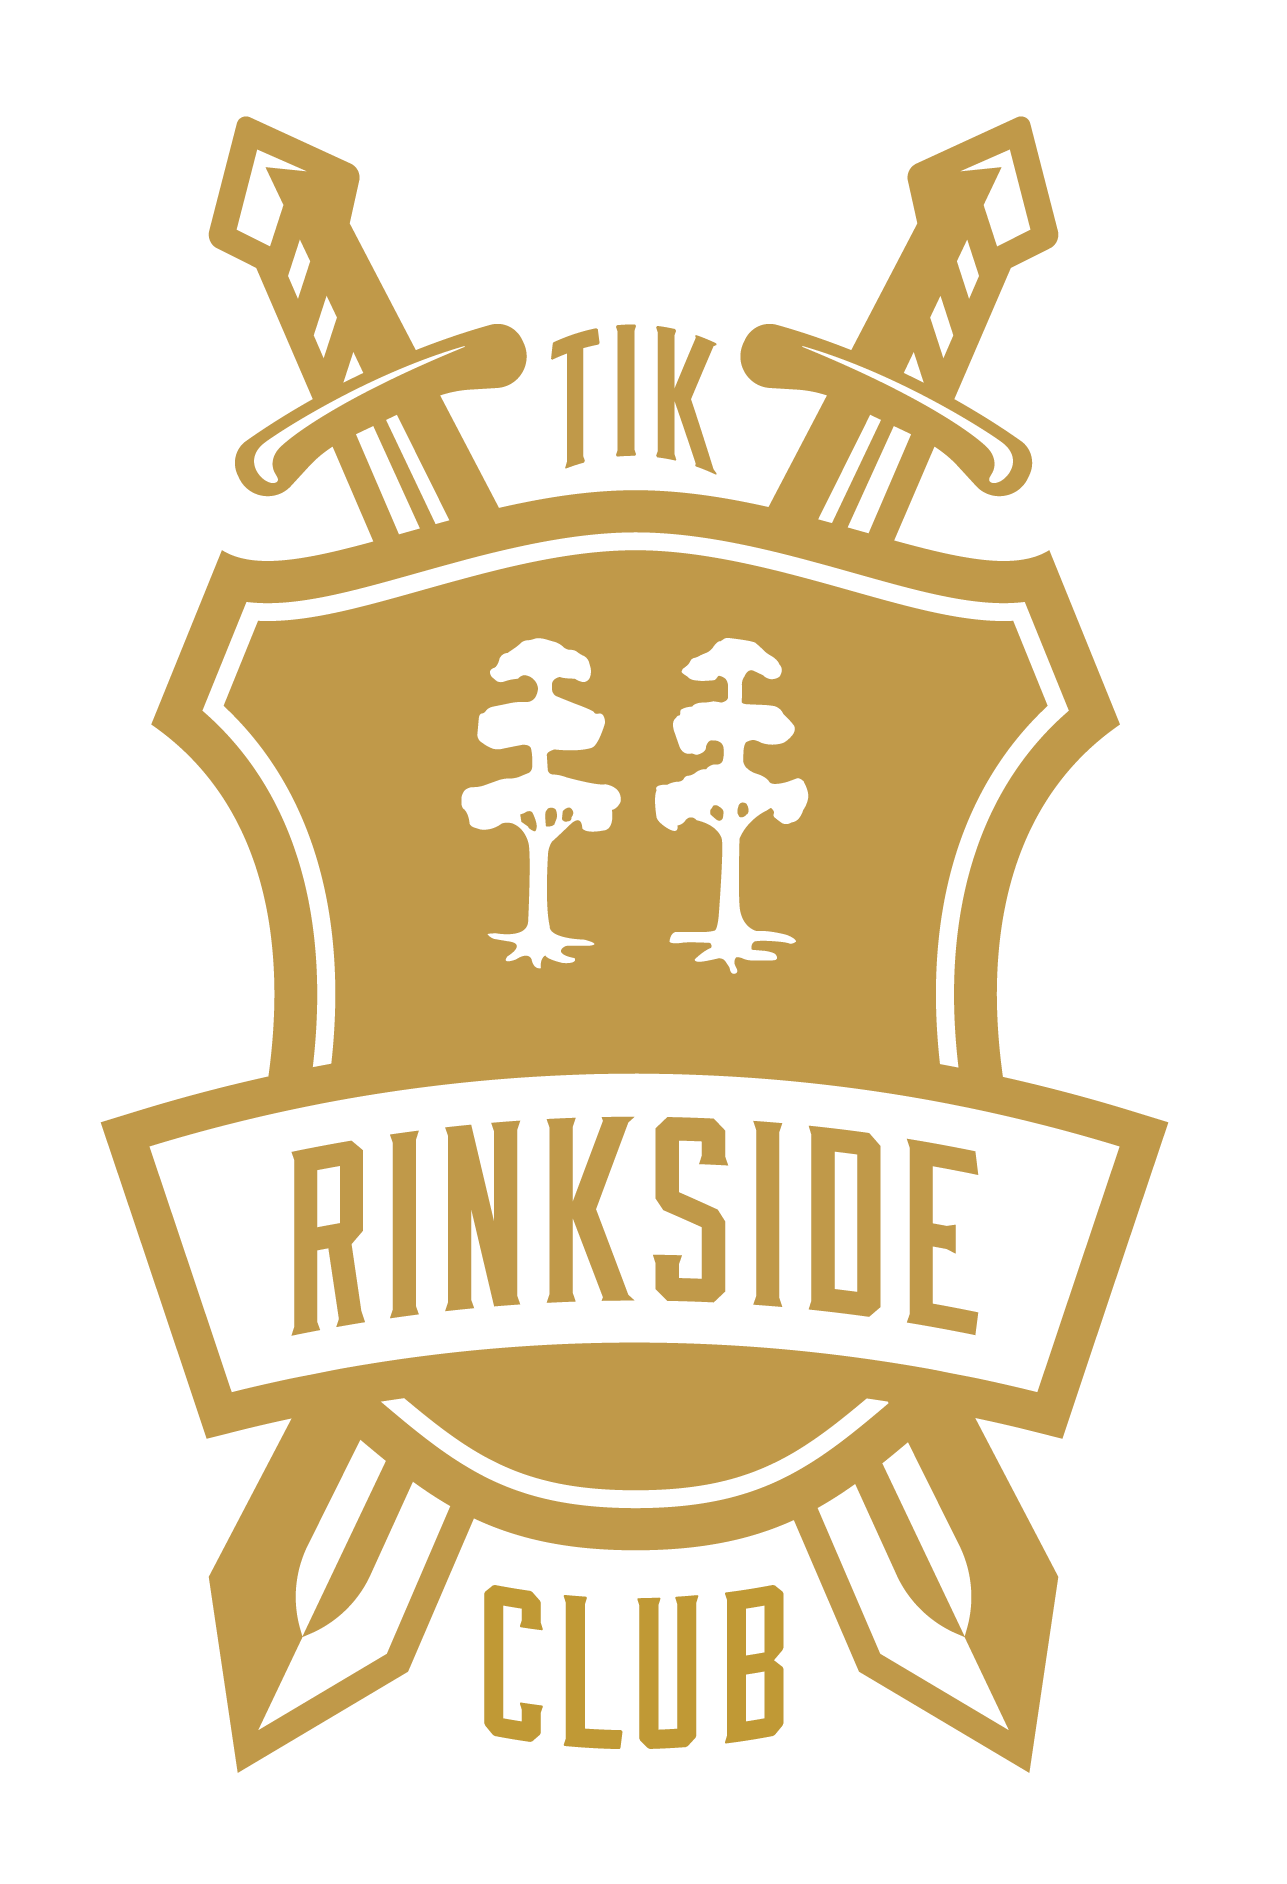 555 TIK RINKSIDE CLUB %e2%80%93 LOGO 01